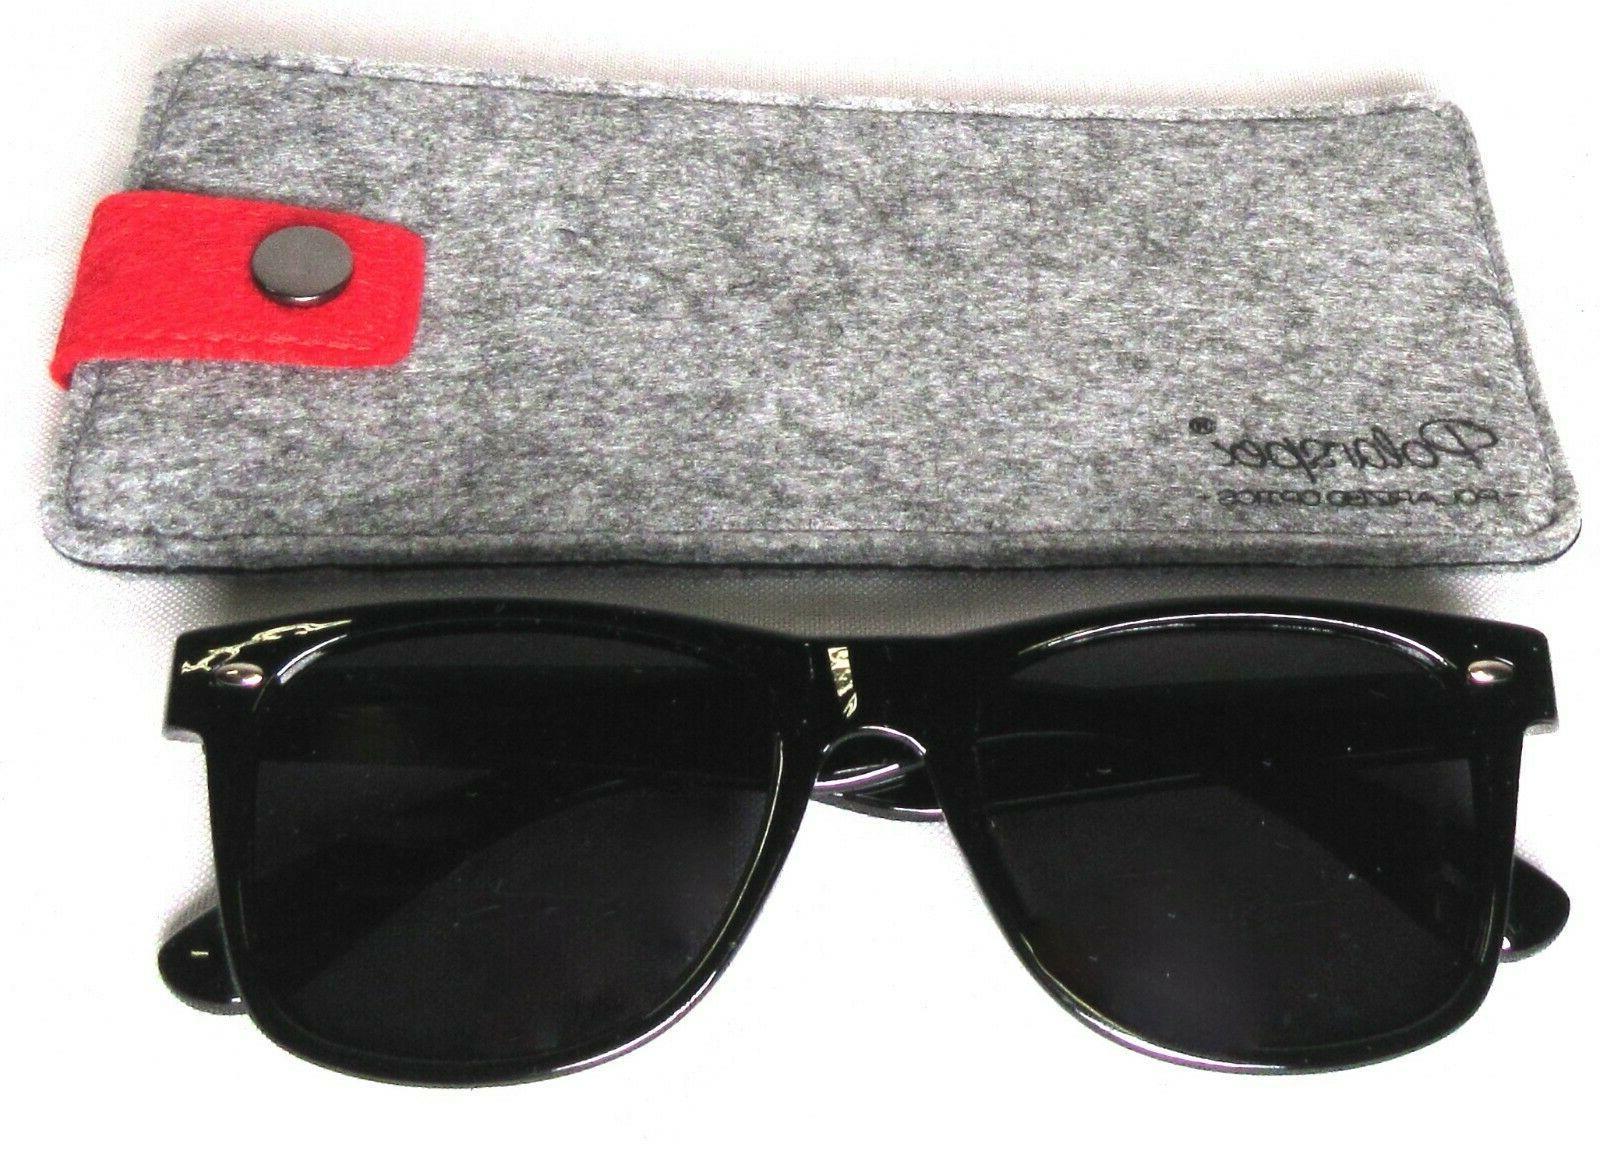 POLARSPEX Polarized Retro Sunglasses Black UV 400 PSX01-BK-SMK